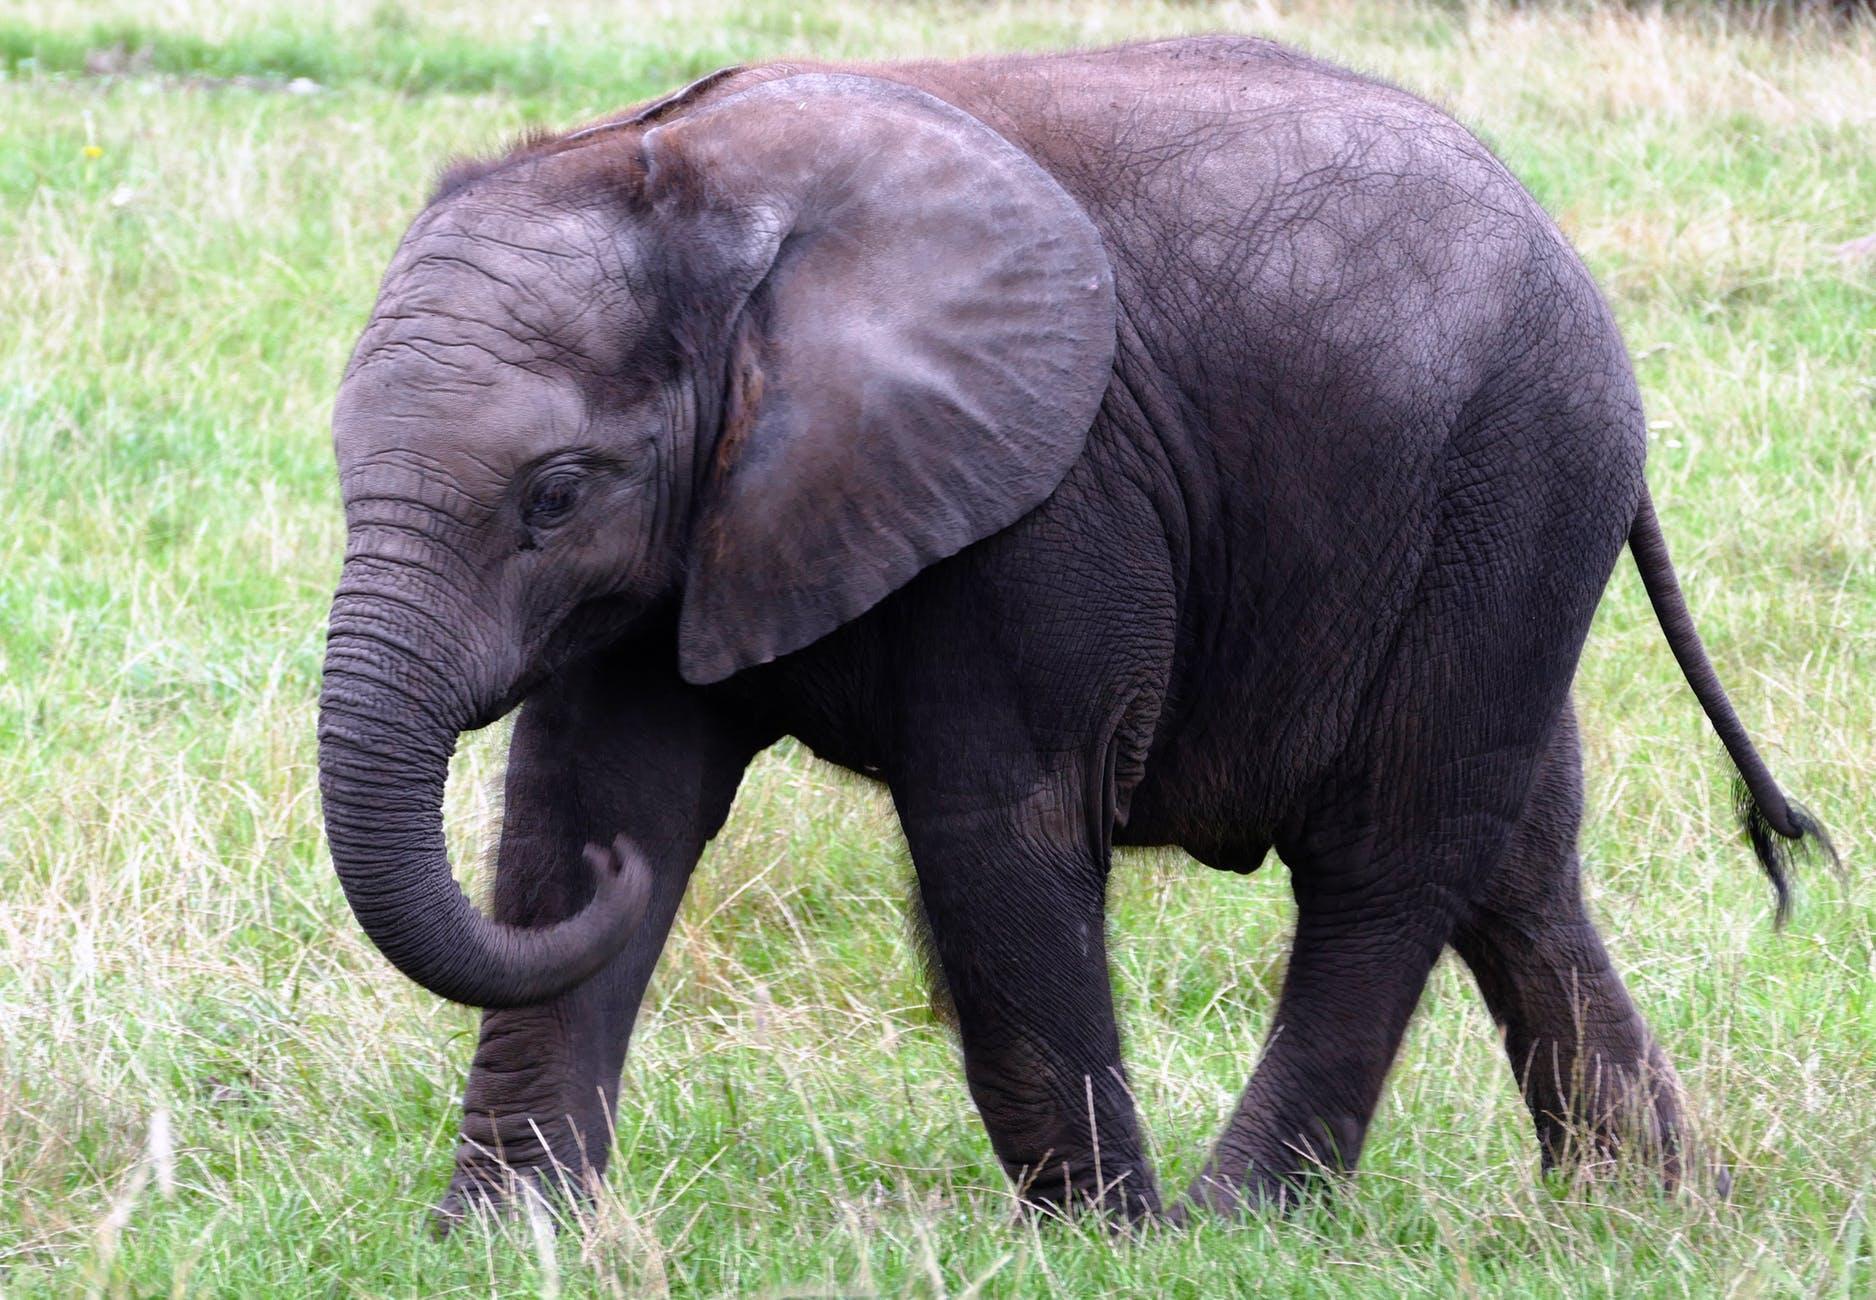 animal big elephant endangered